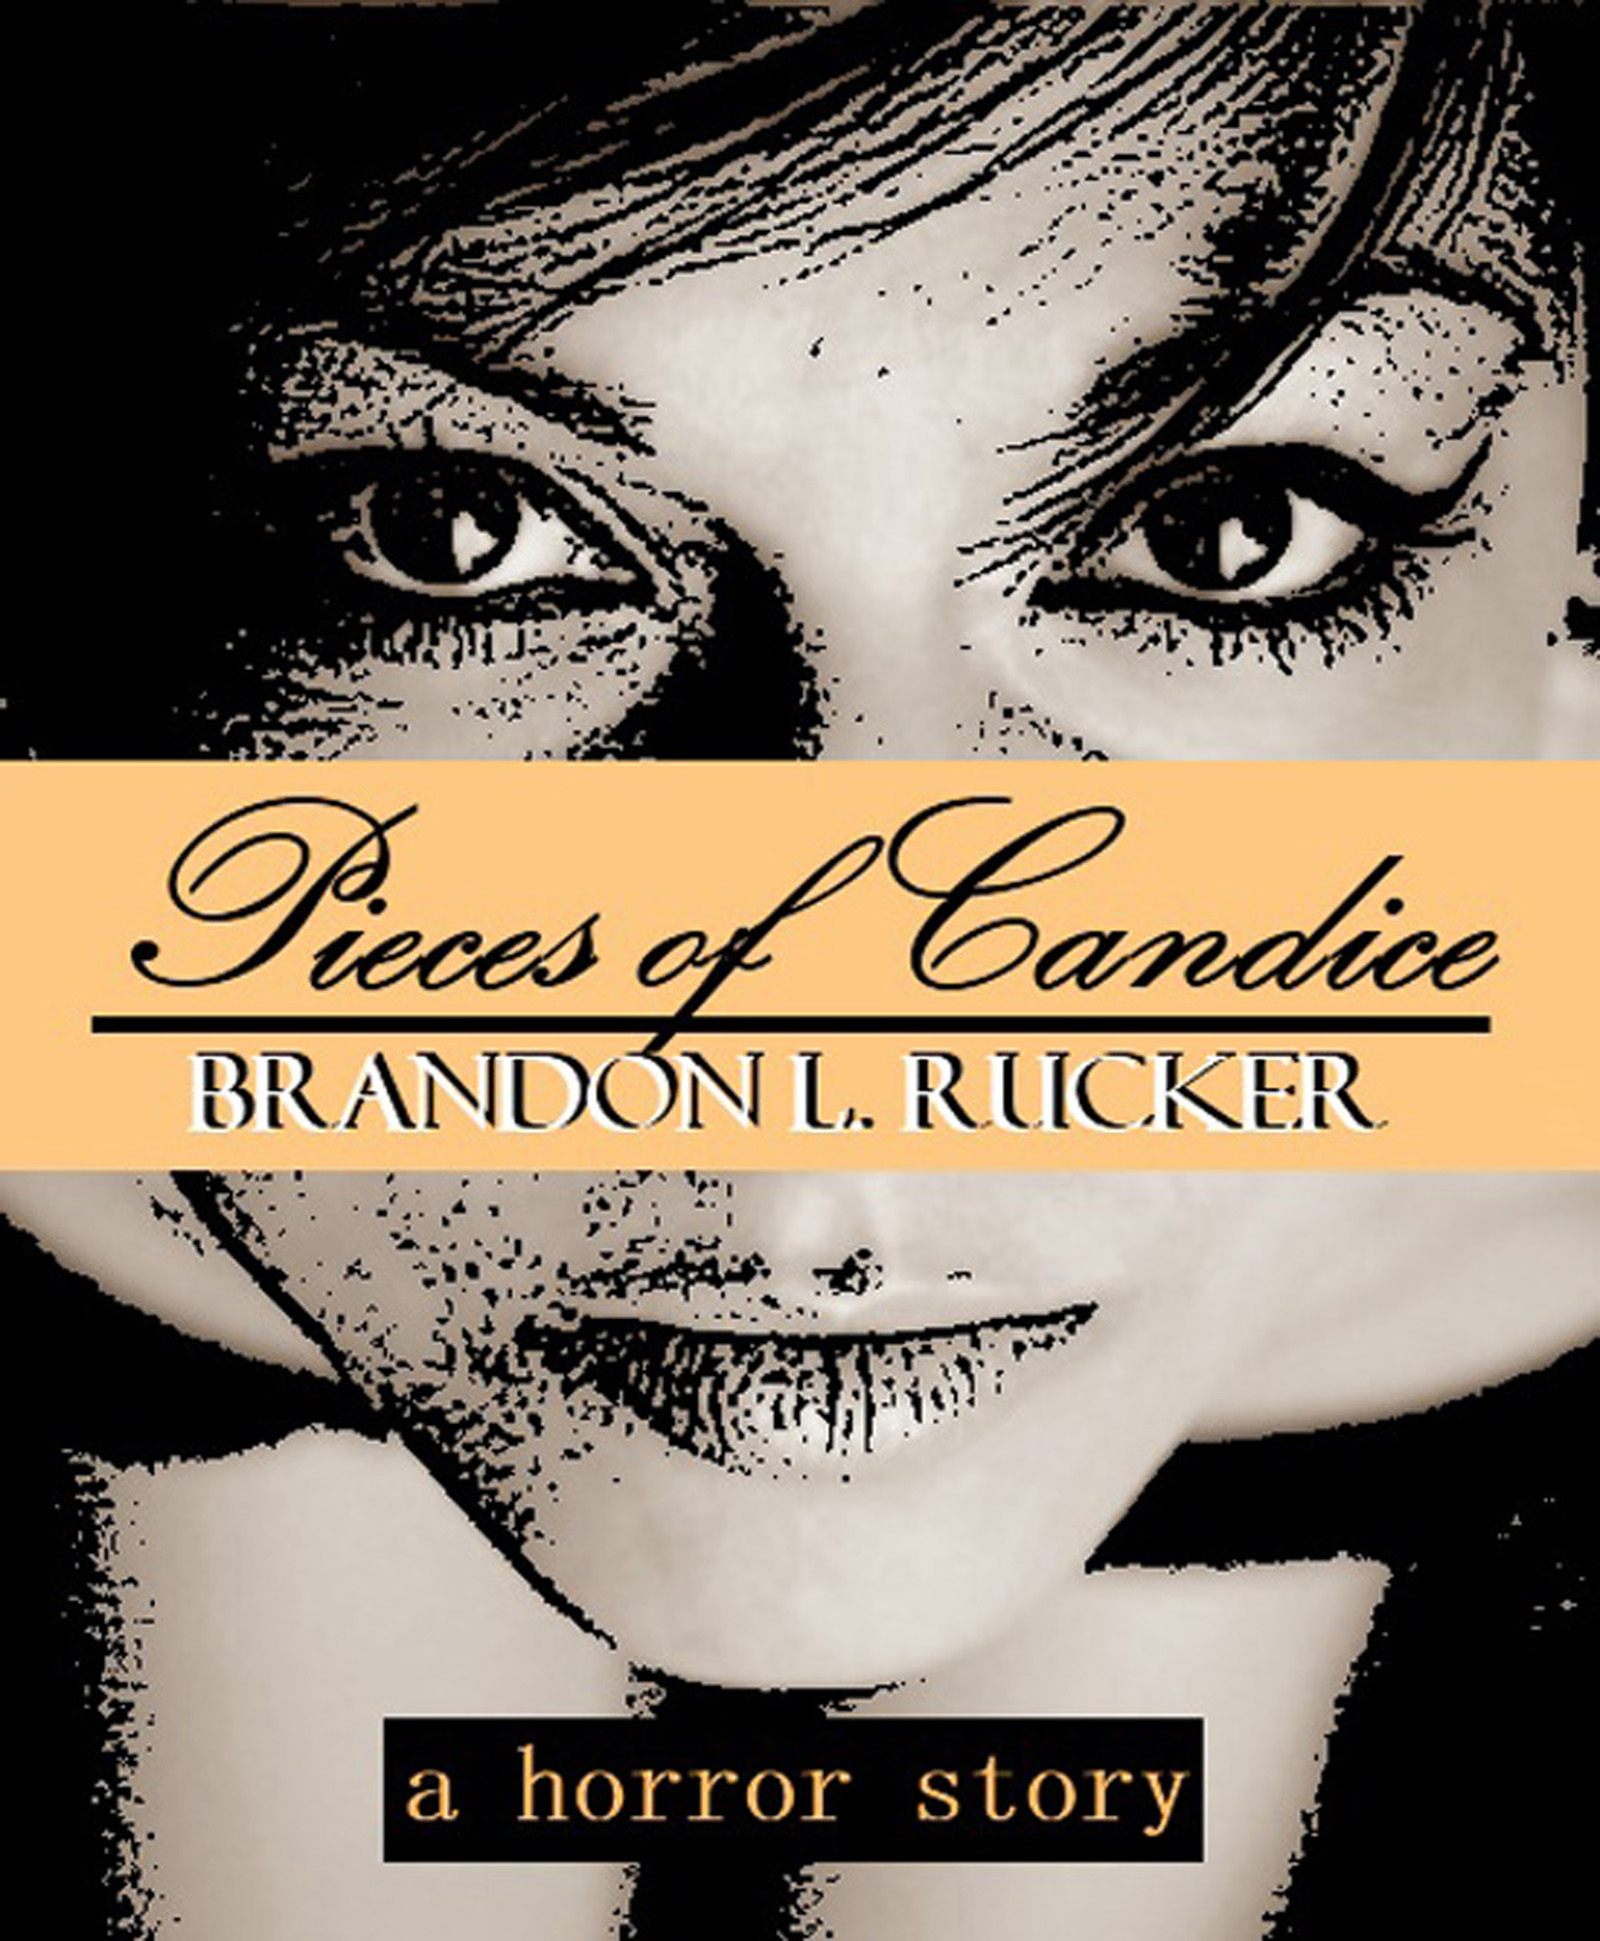 the neighbors in the short story of brandon